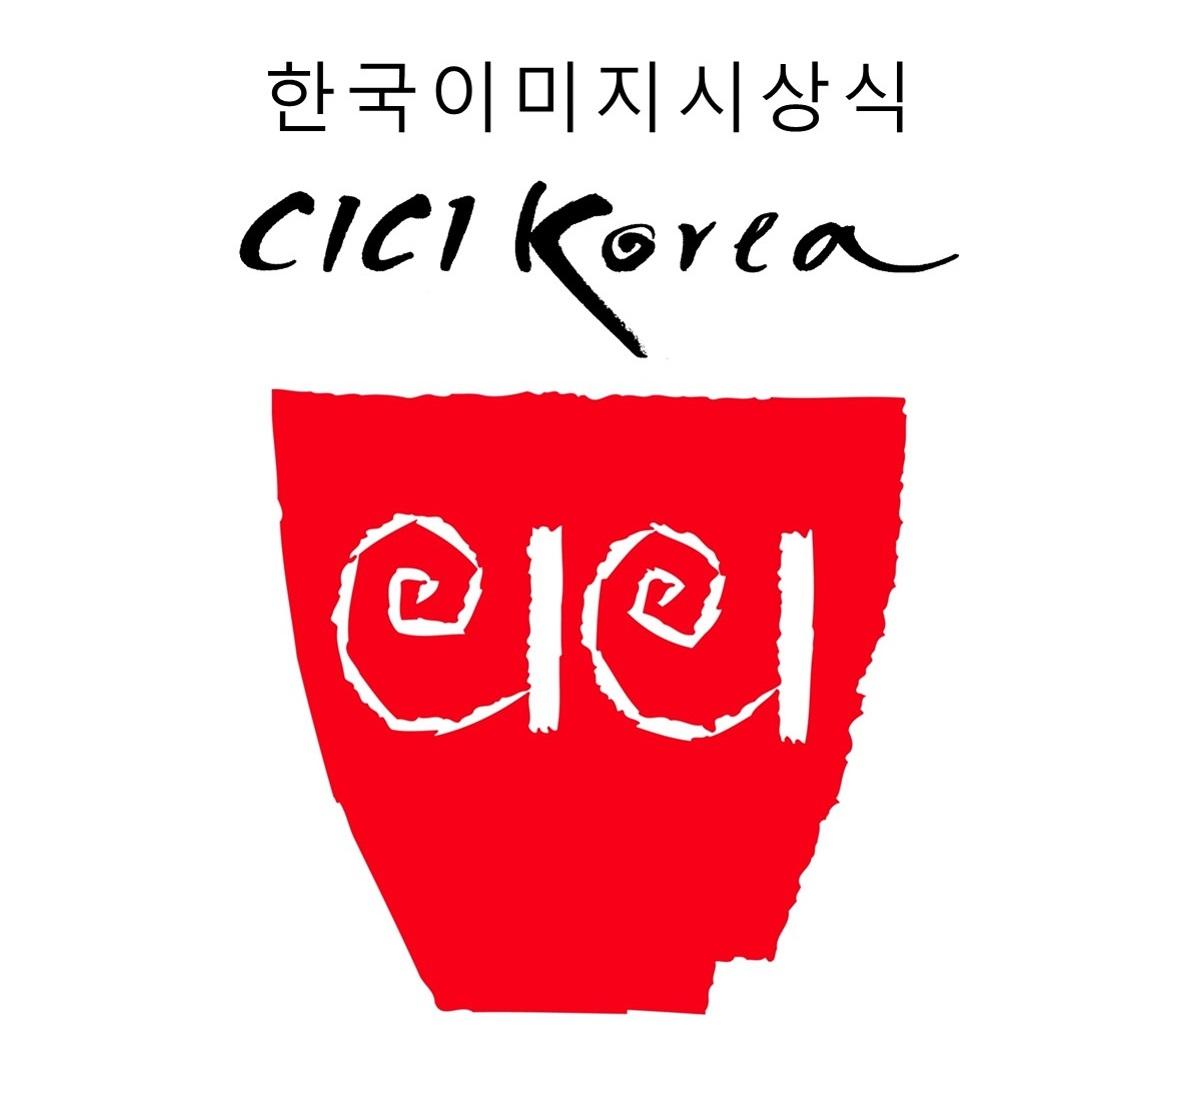 CICI Korea 2021.jpg